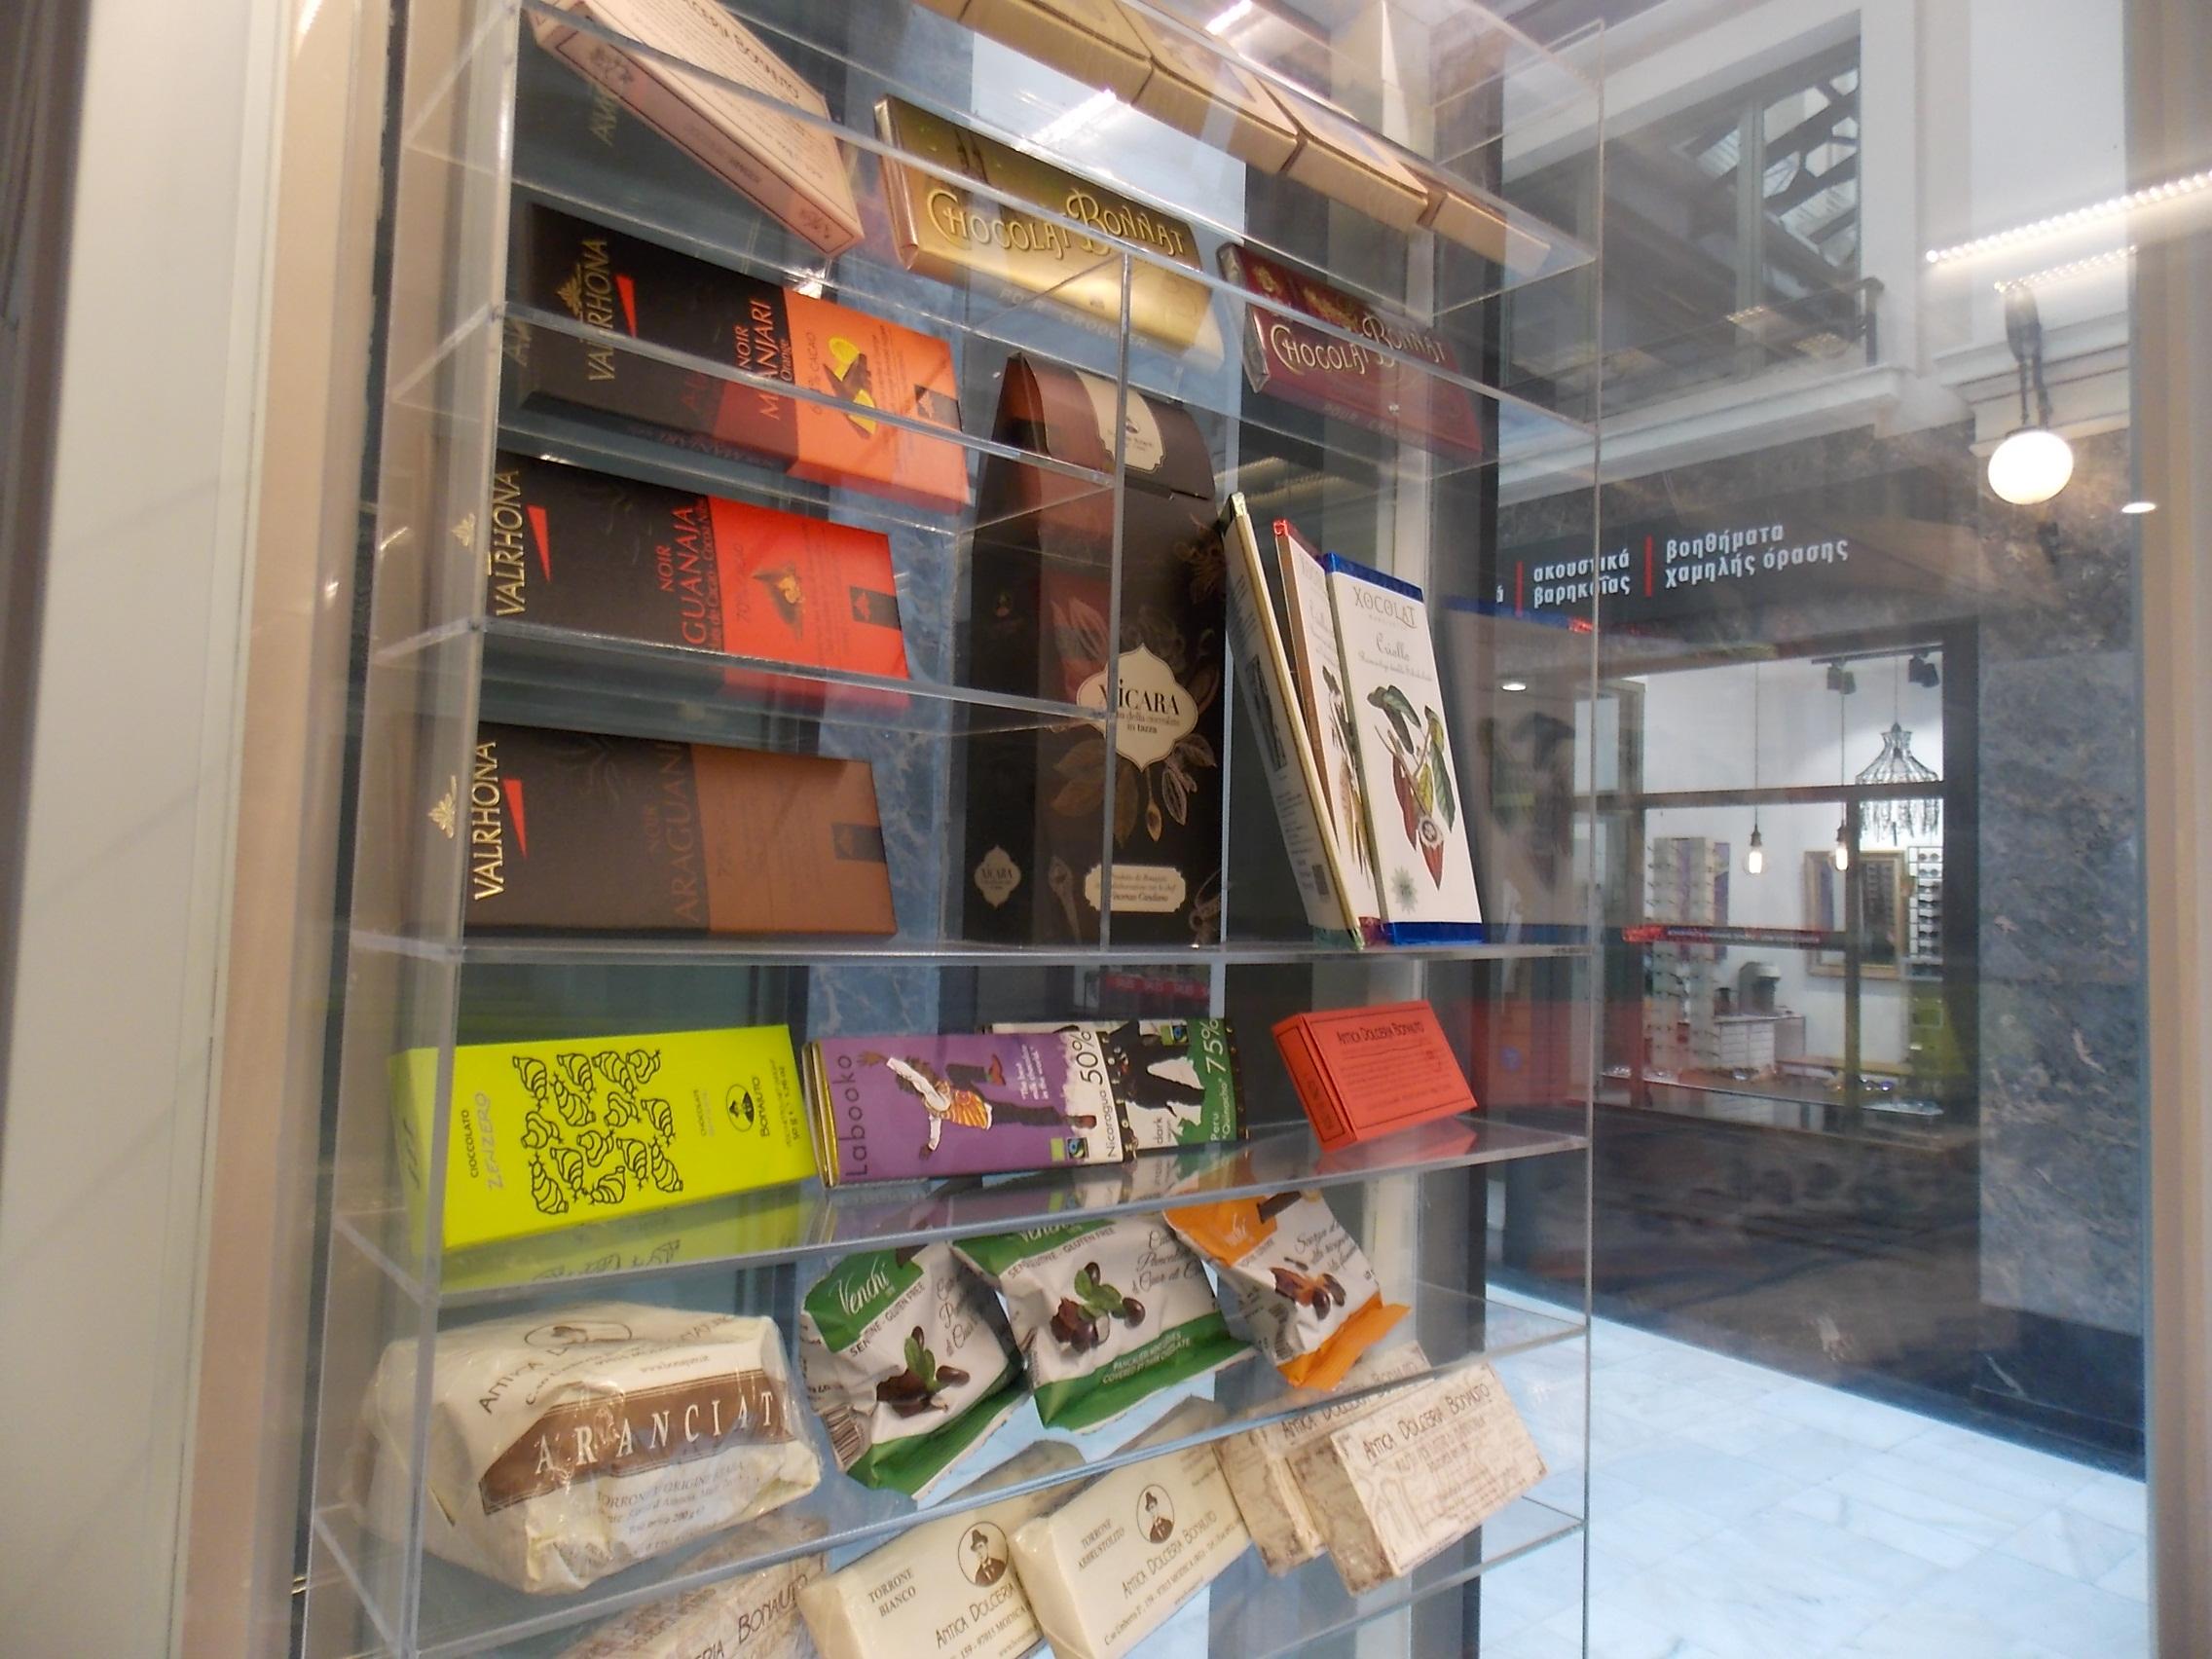 Chocotopia: 'Η αλλιώς η καλύτερη σοκολατερί της Αθήνας